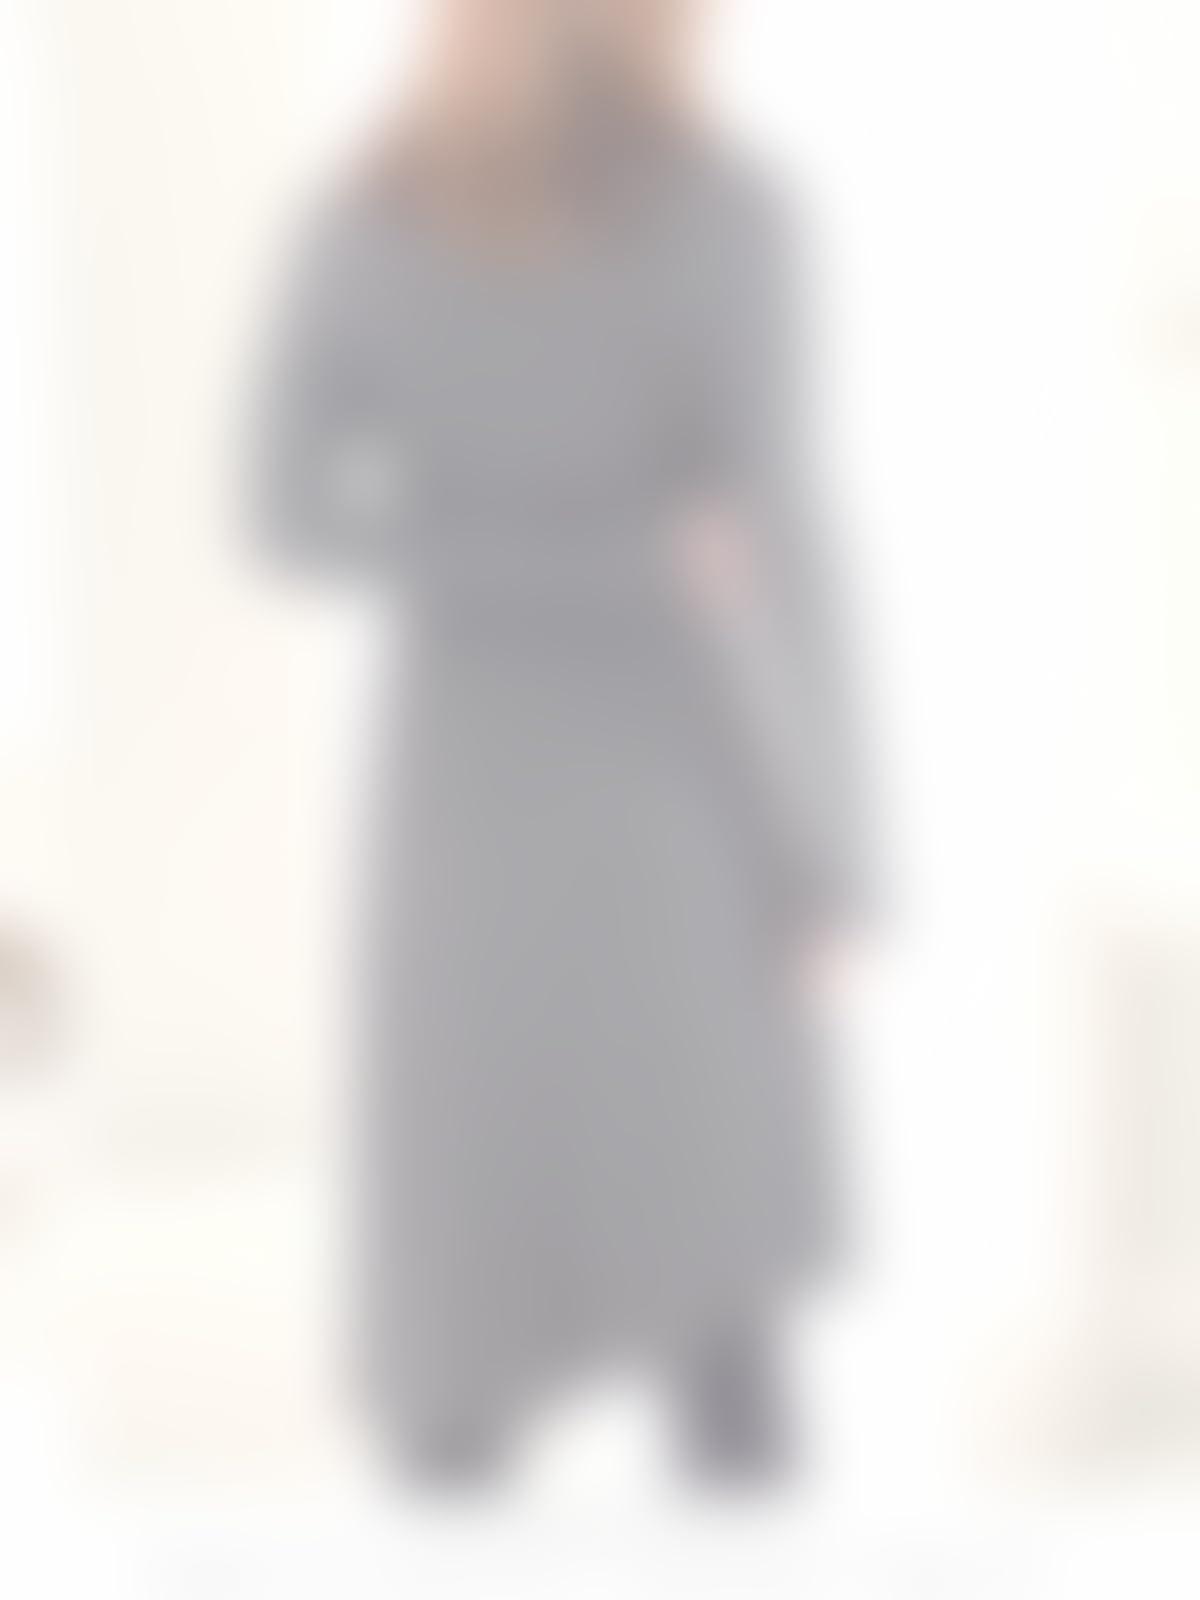 2e3dfebffa Amazon.com: Charcoal Gray Asymmetric Yoga Cover-Up, Cardigan, from Erin  Draper (Sizes XS, S, M, L, XL and XXL): Handmade